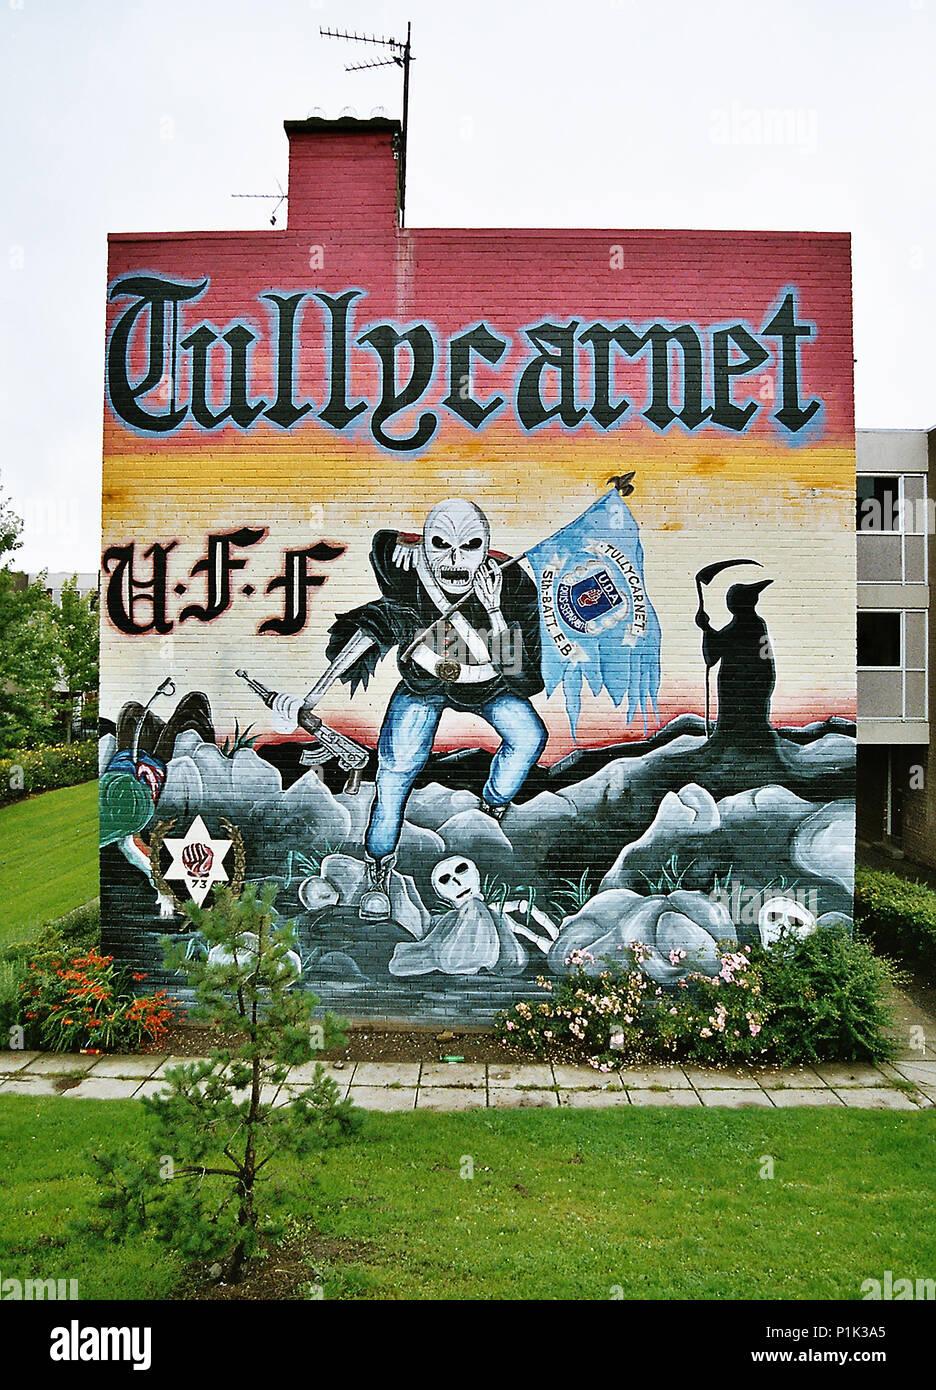 Belfast sectarian graffiti, kings road, Tullycarnet - Stock Image